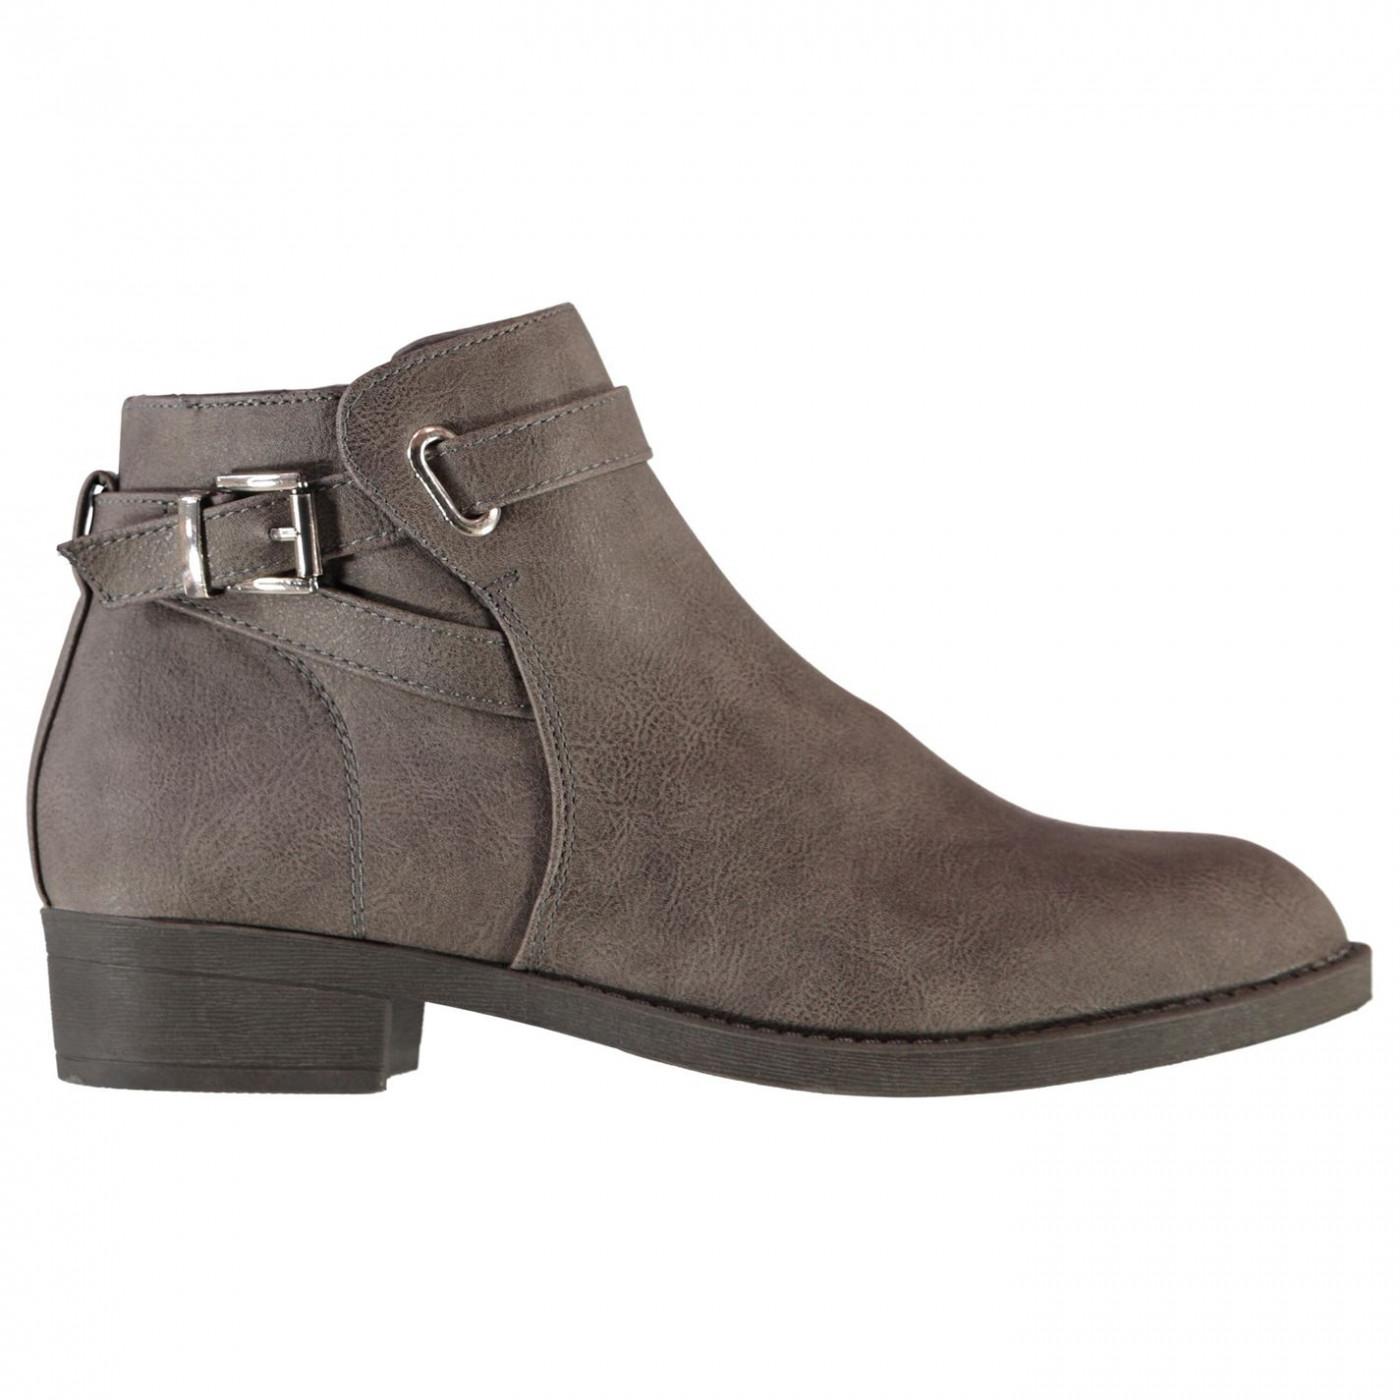 Miso Buckle Ladies Boots